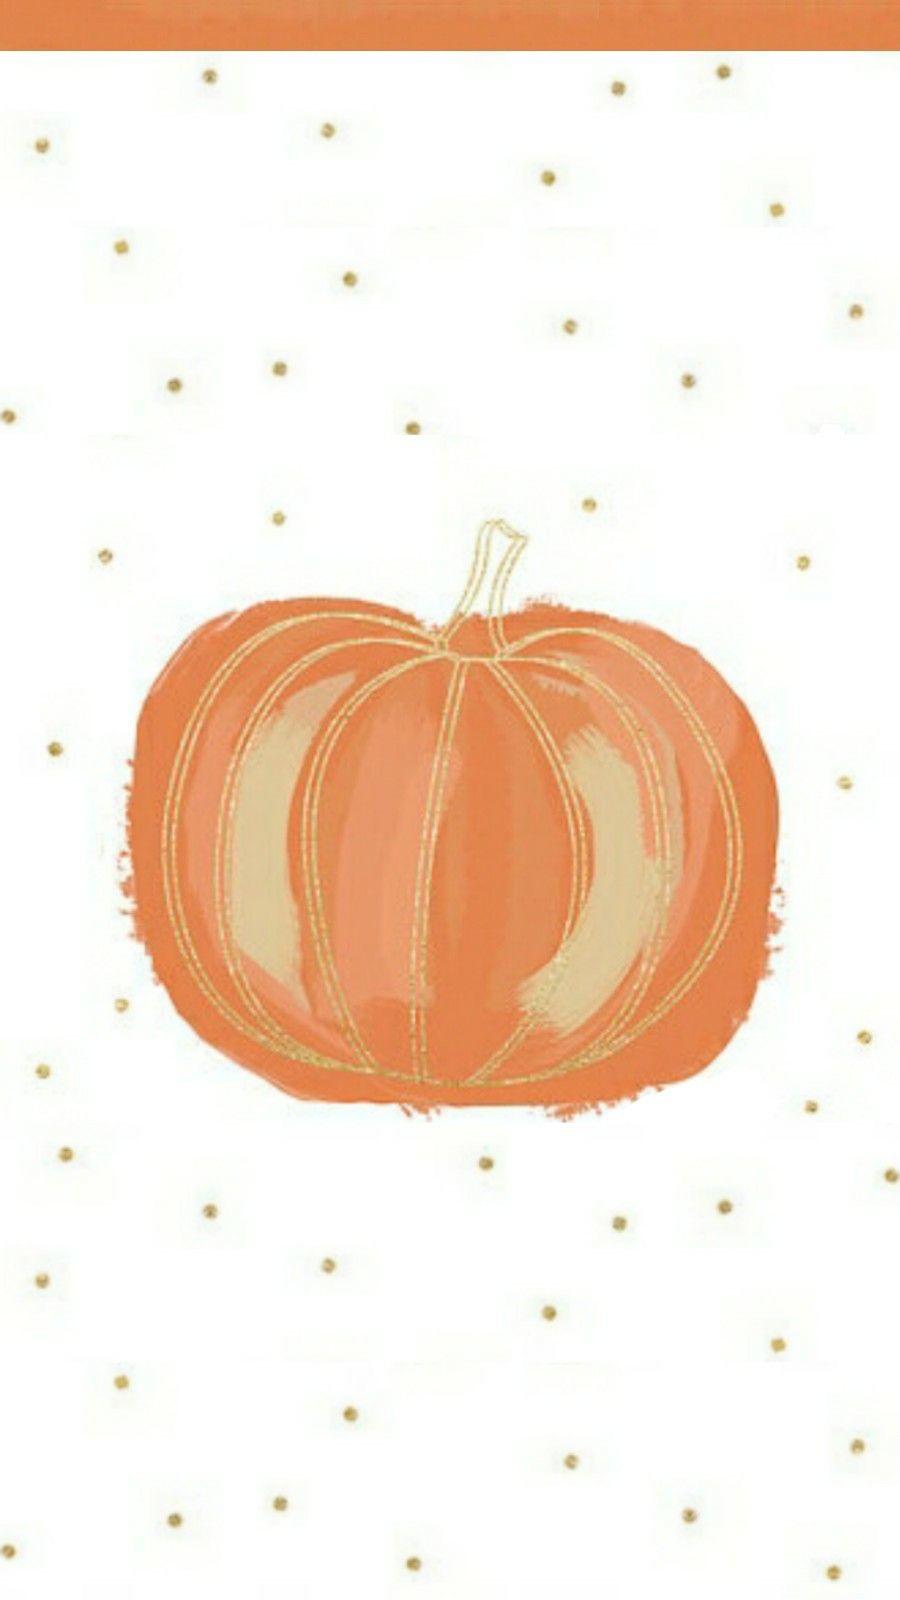 Amazing Wallpaper Halloween Pinterest - 61ec0fbf0aaafce693b448a91e280301  Pictures_394274.jpg